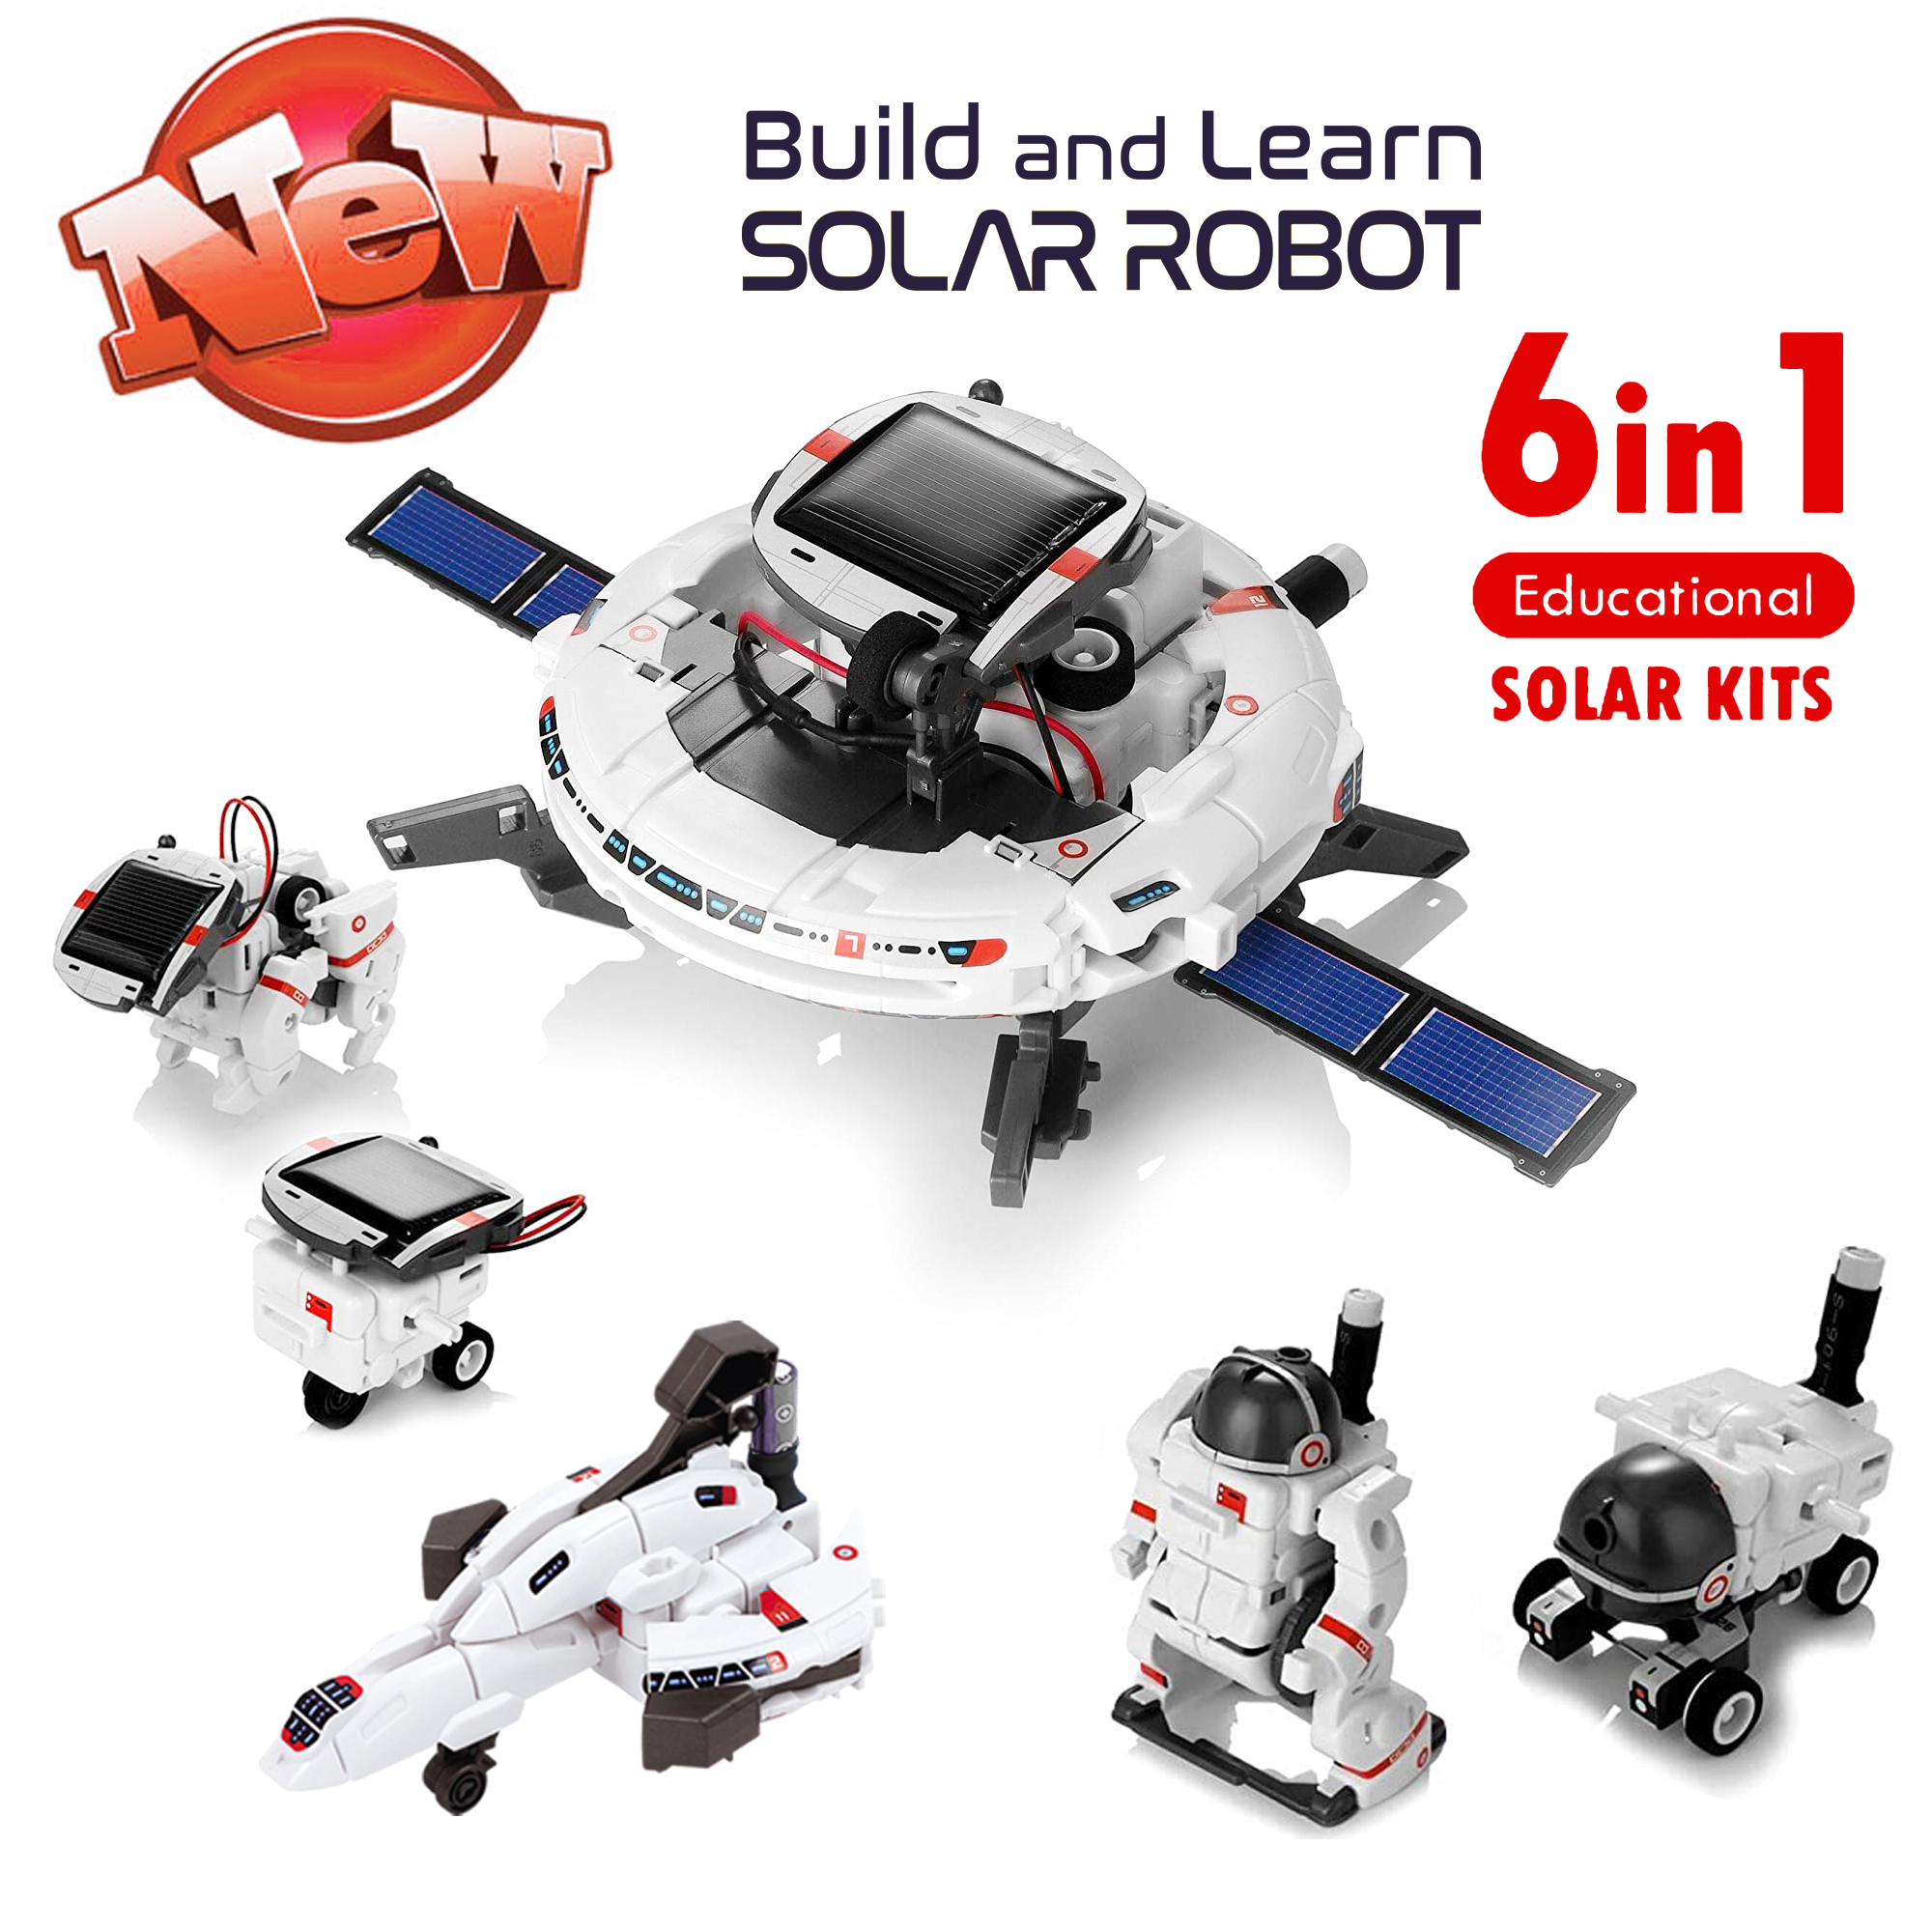 Solar robot Toys, 6 in 1 STEM Educational Solar Space Building Toys, DIY Science Solar robot diy  Kit for Kids Aged